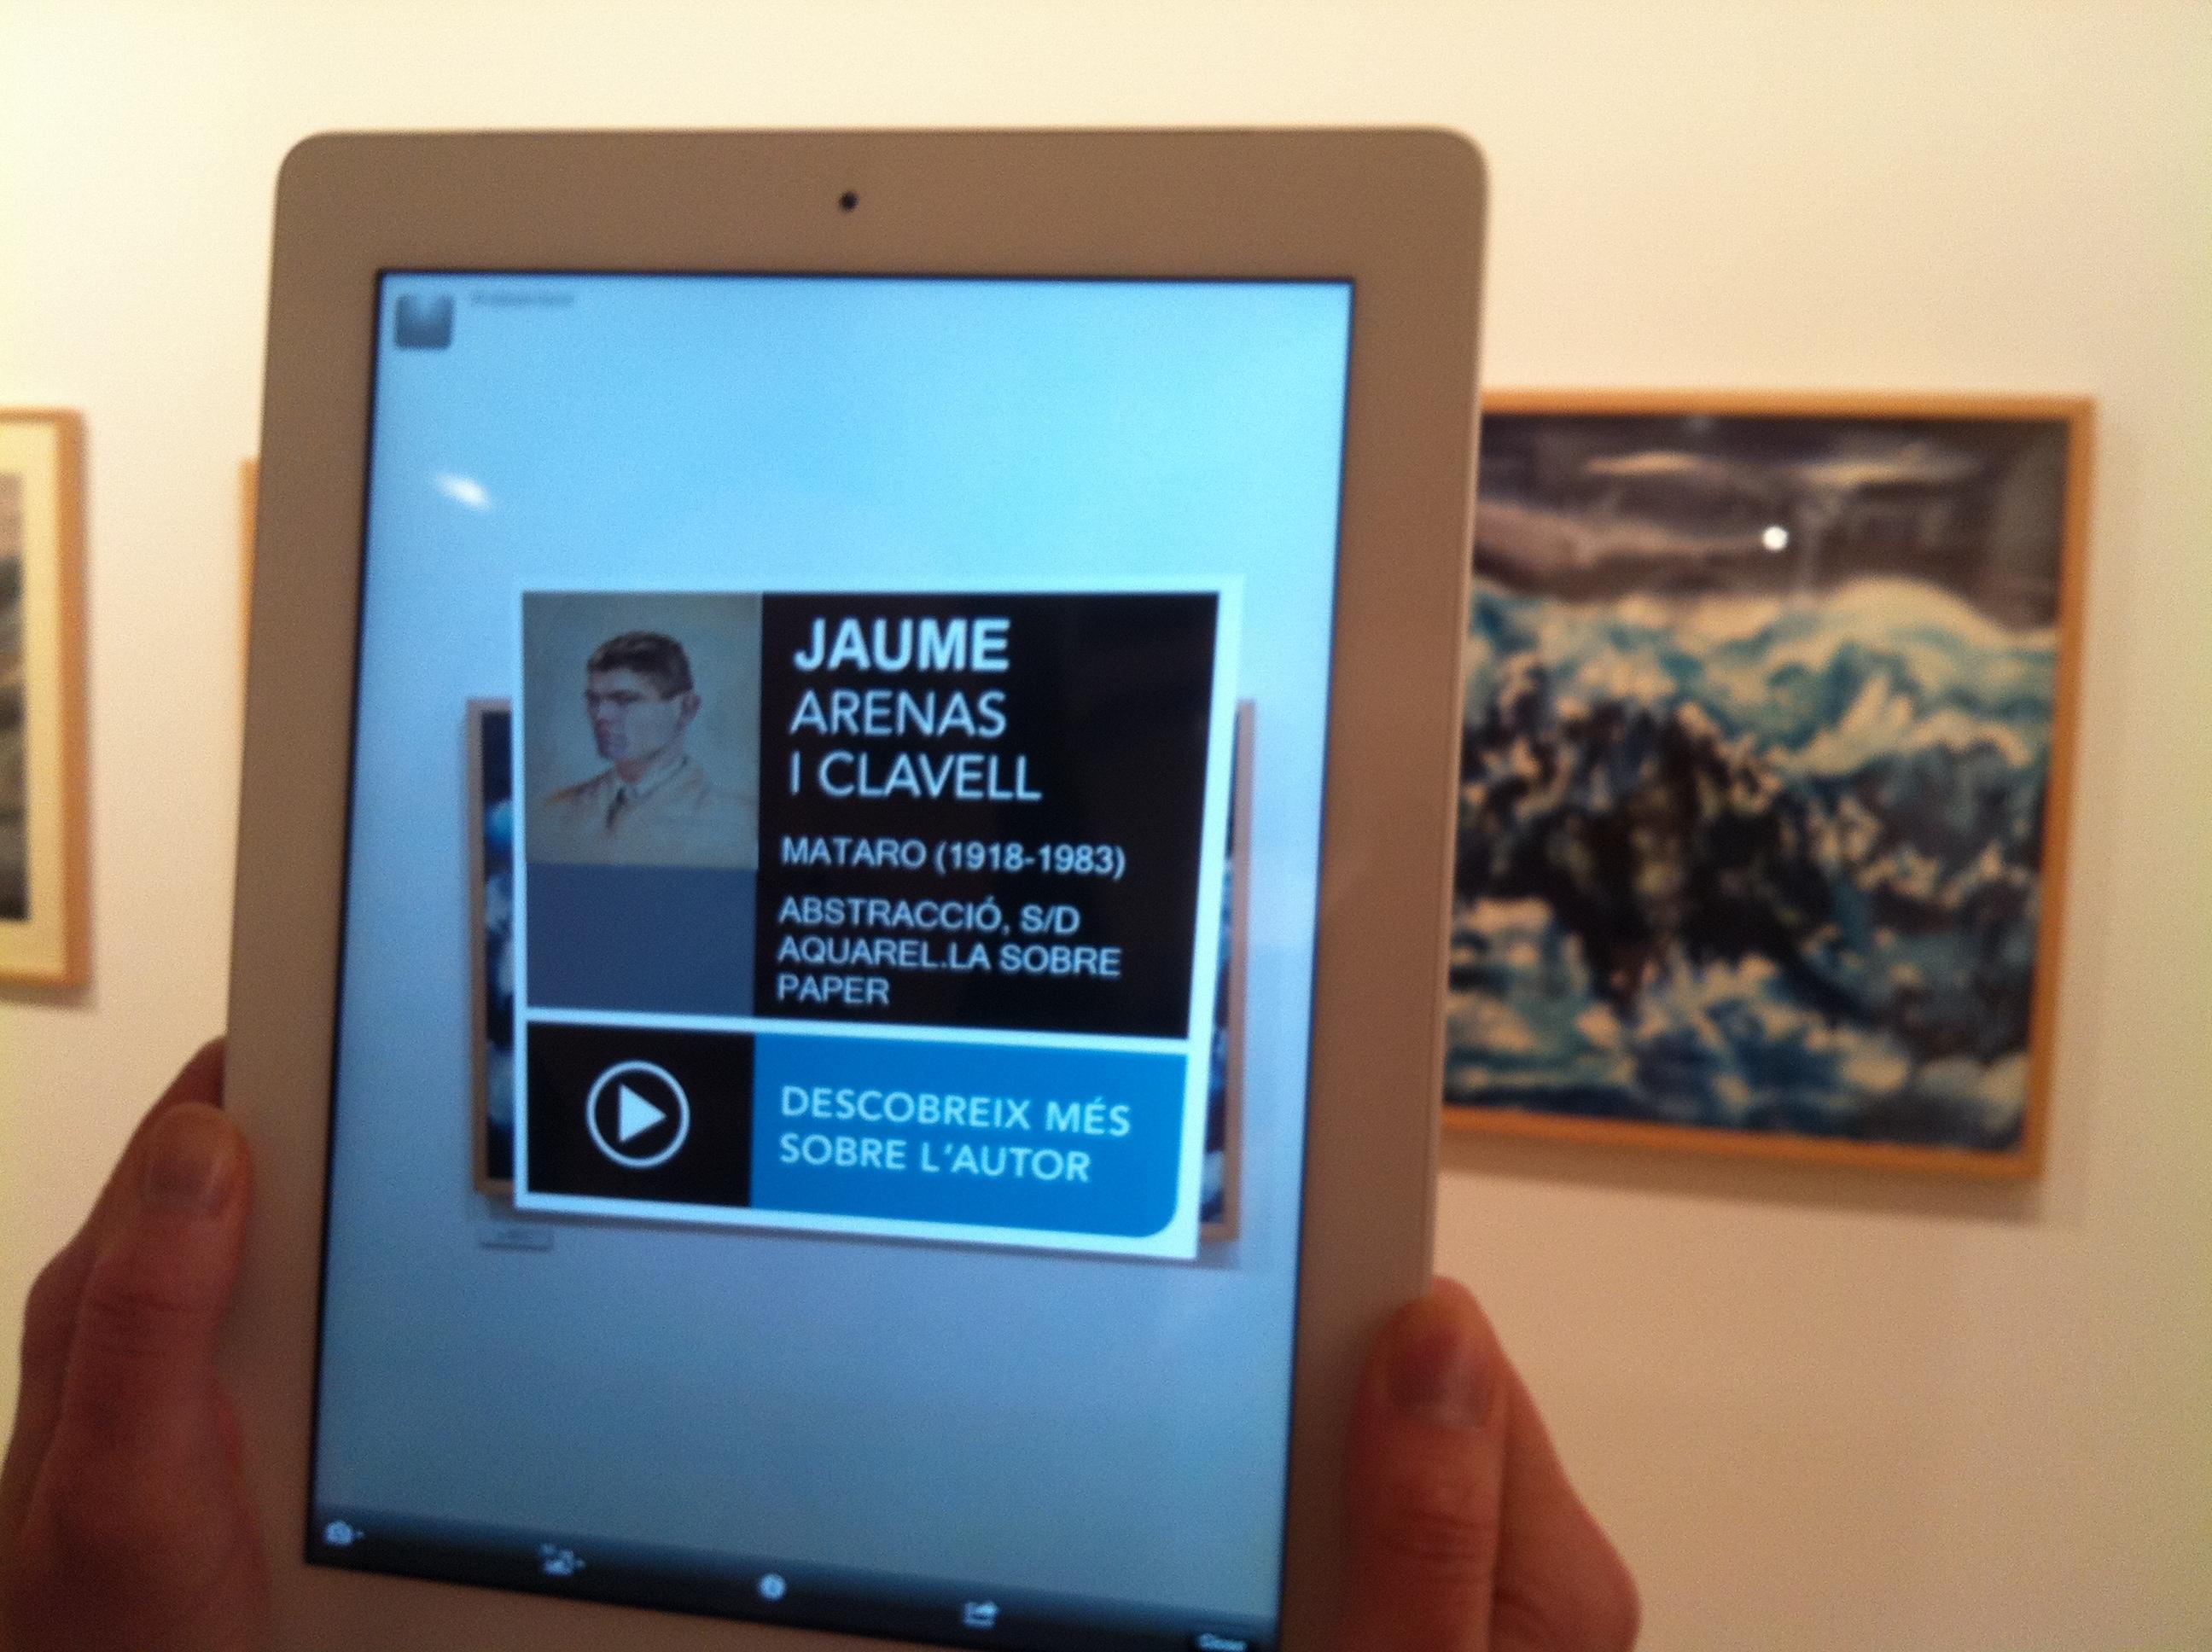 Augmented_reality_at_Museu_de_Matar%C3%B3_linking_to_Catalan_Wikipedia_%2815%29.JPG